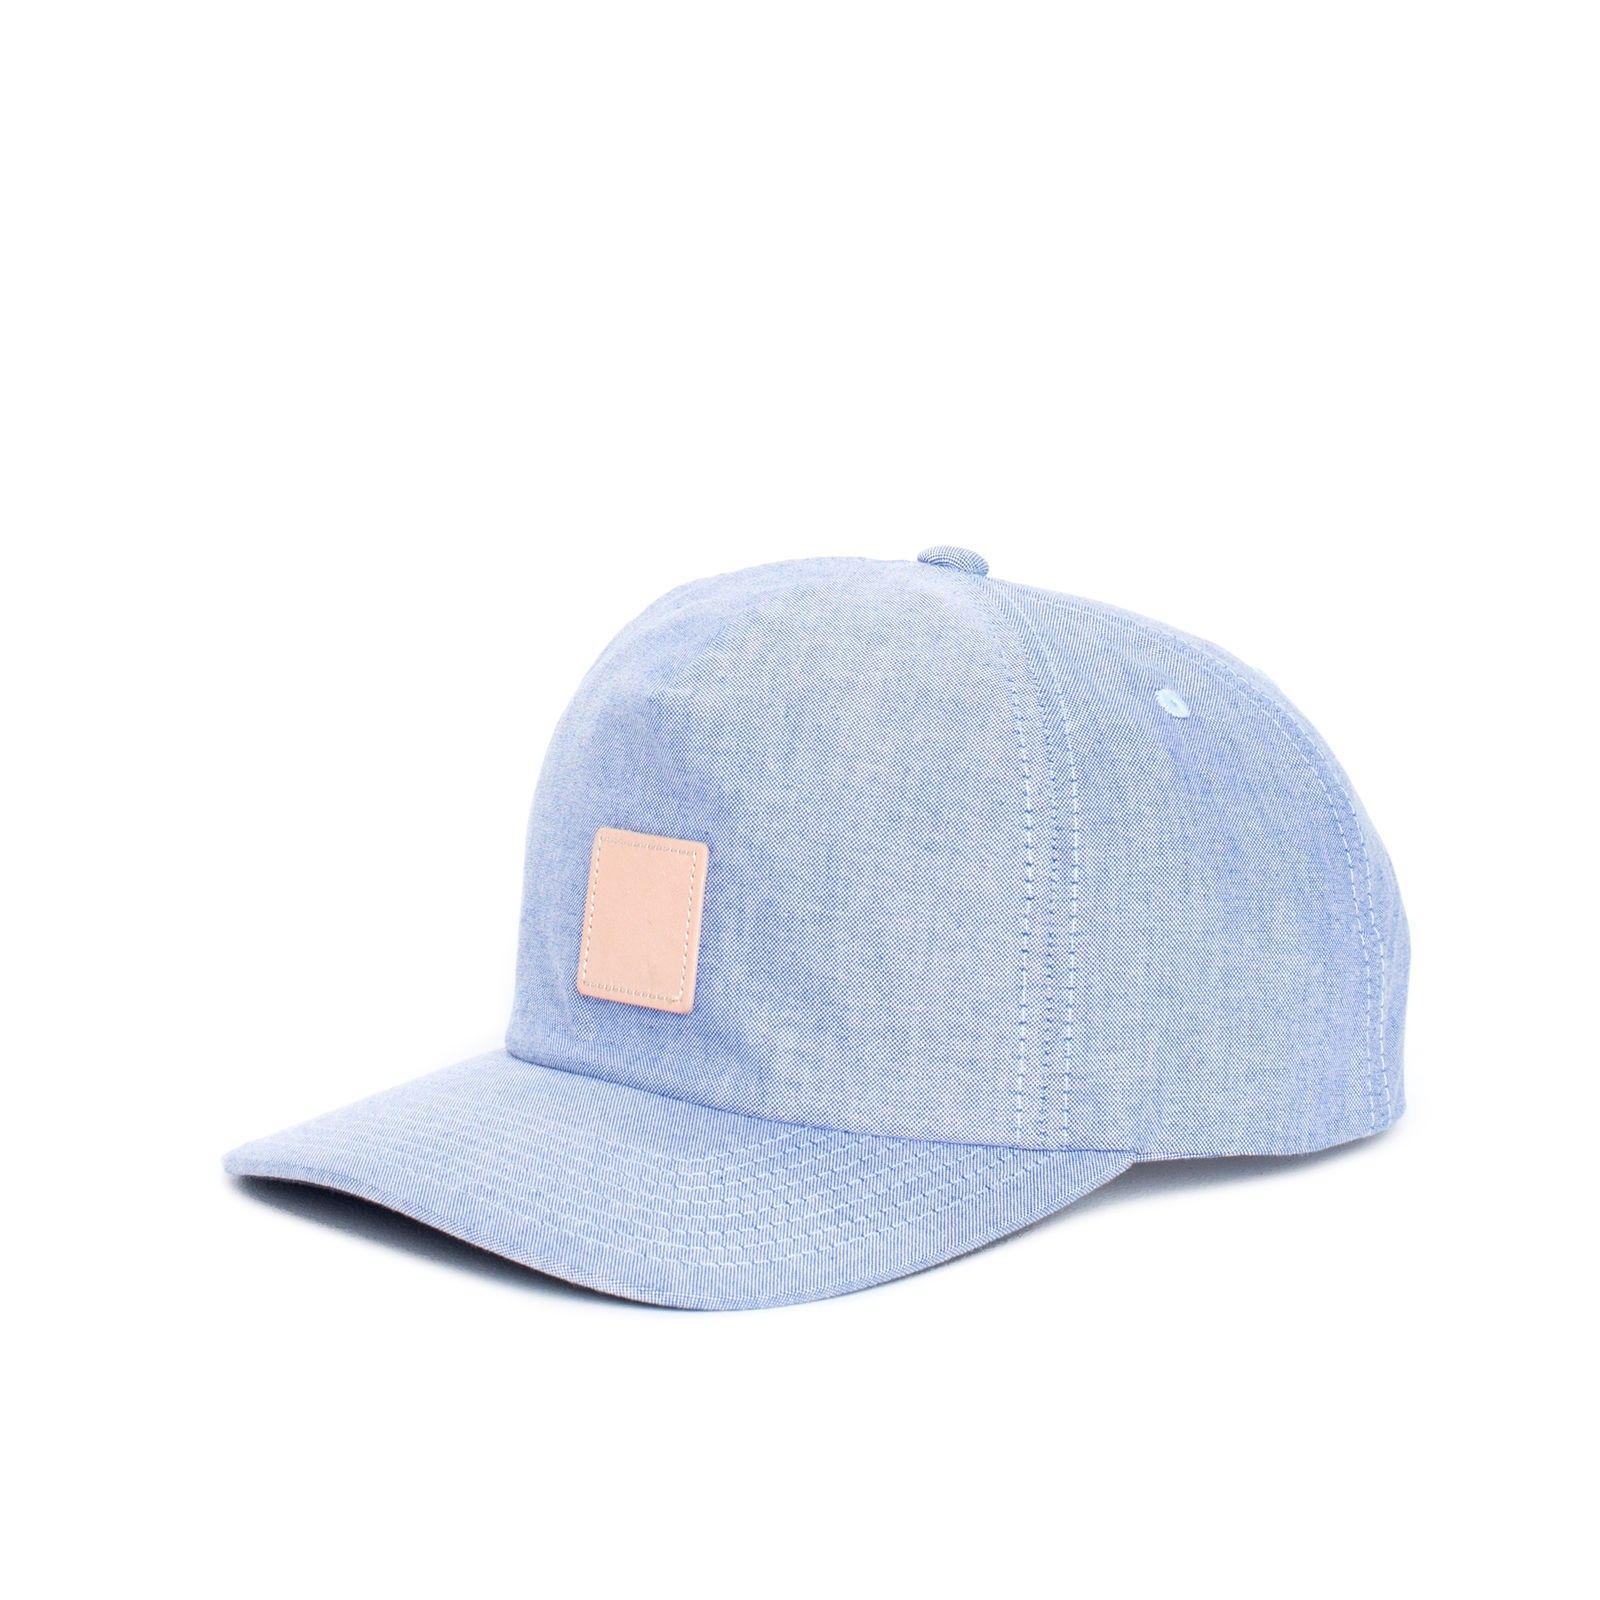 27c736146a8 Herschel Niles Hat. Herschel Niles Hat Herschel Supply Co